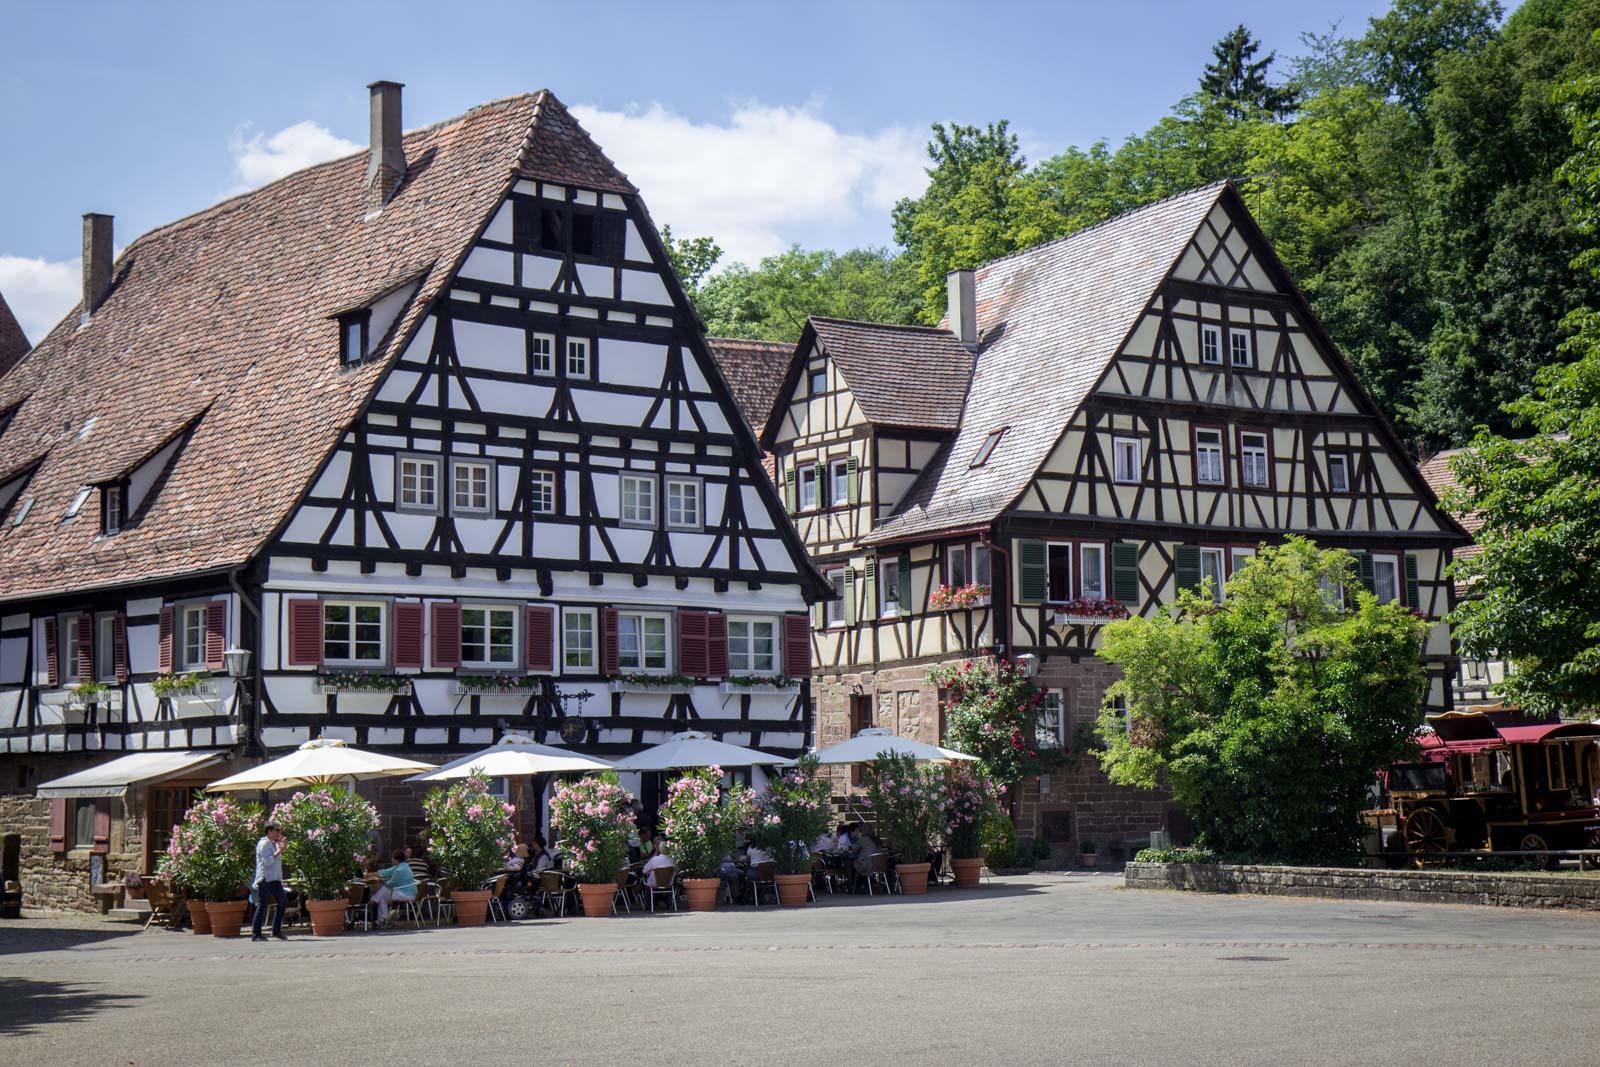 Maulbronn Monastery Complex, Maulbronn, Germany